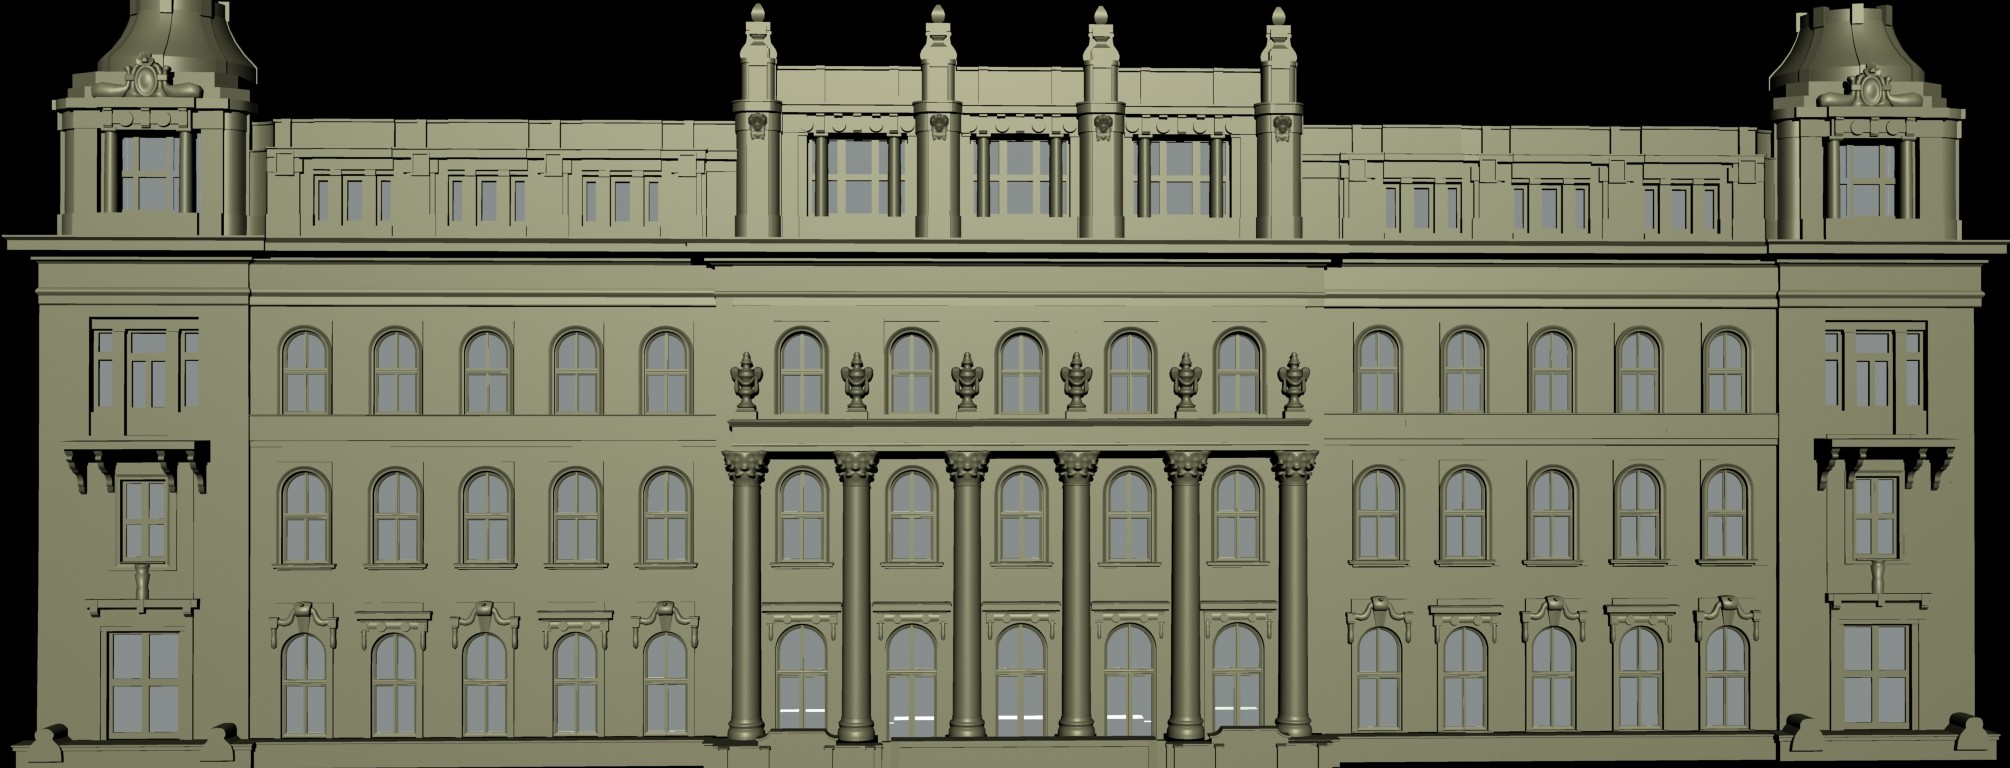 classic_building2.jpg